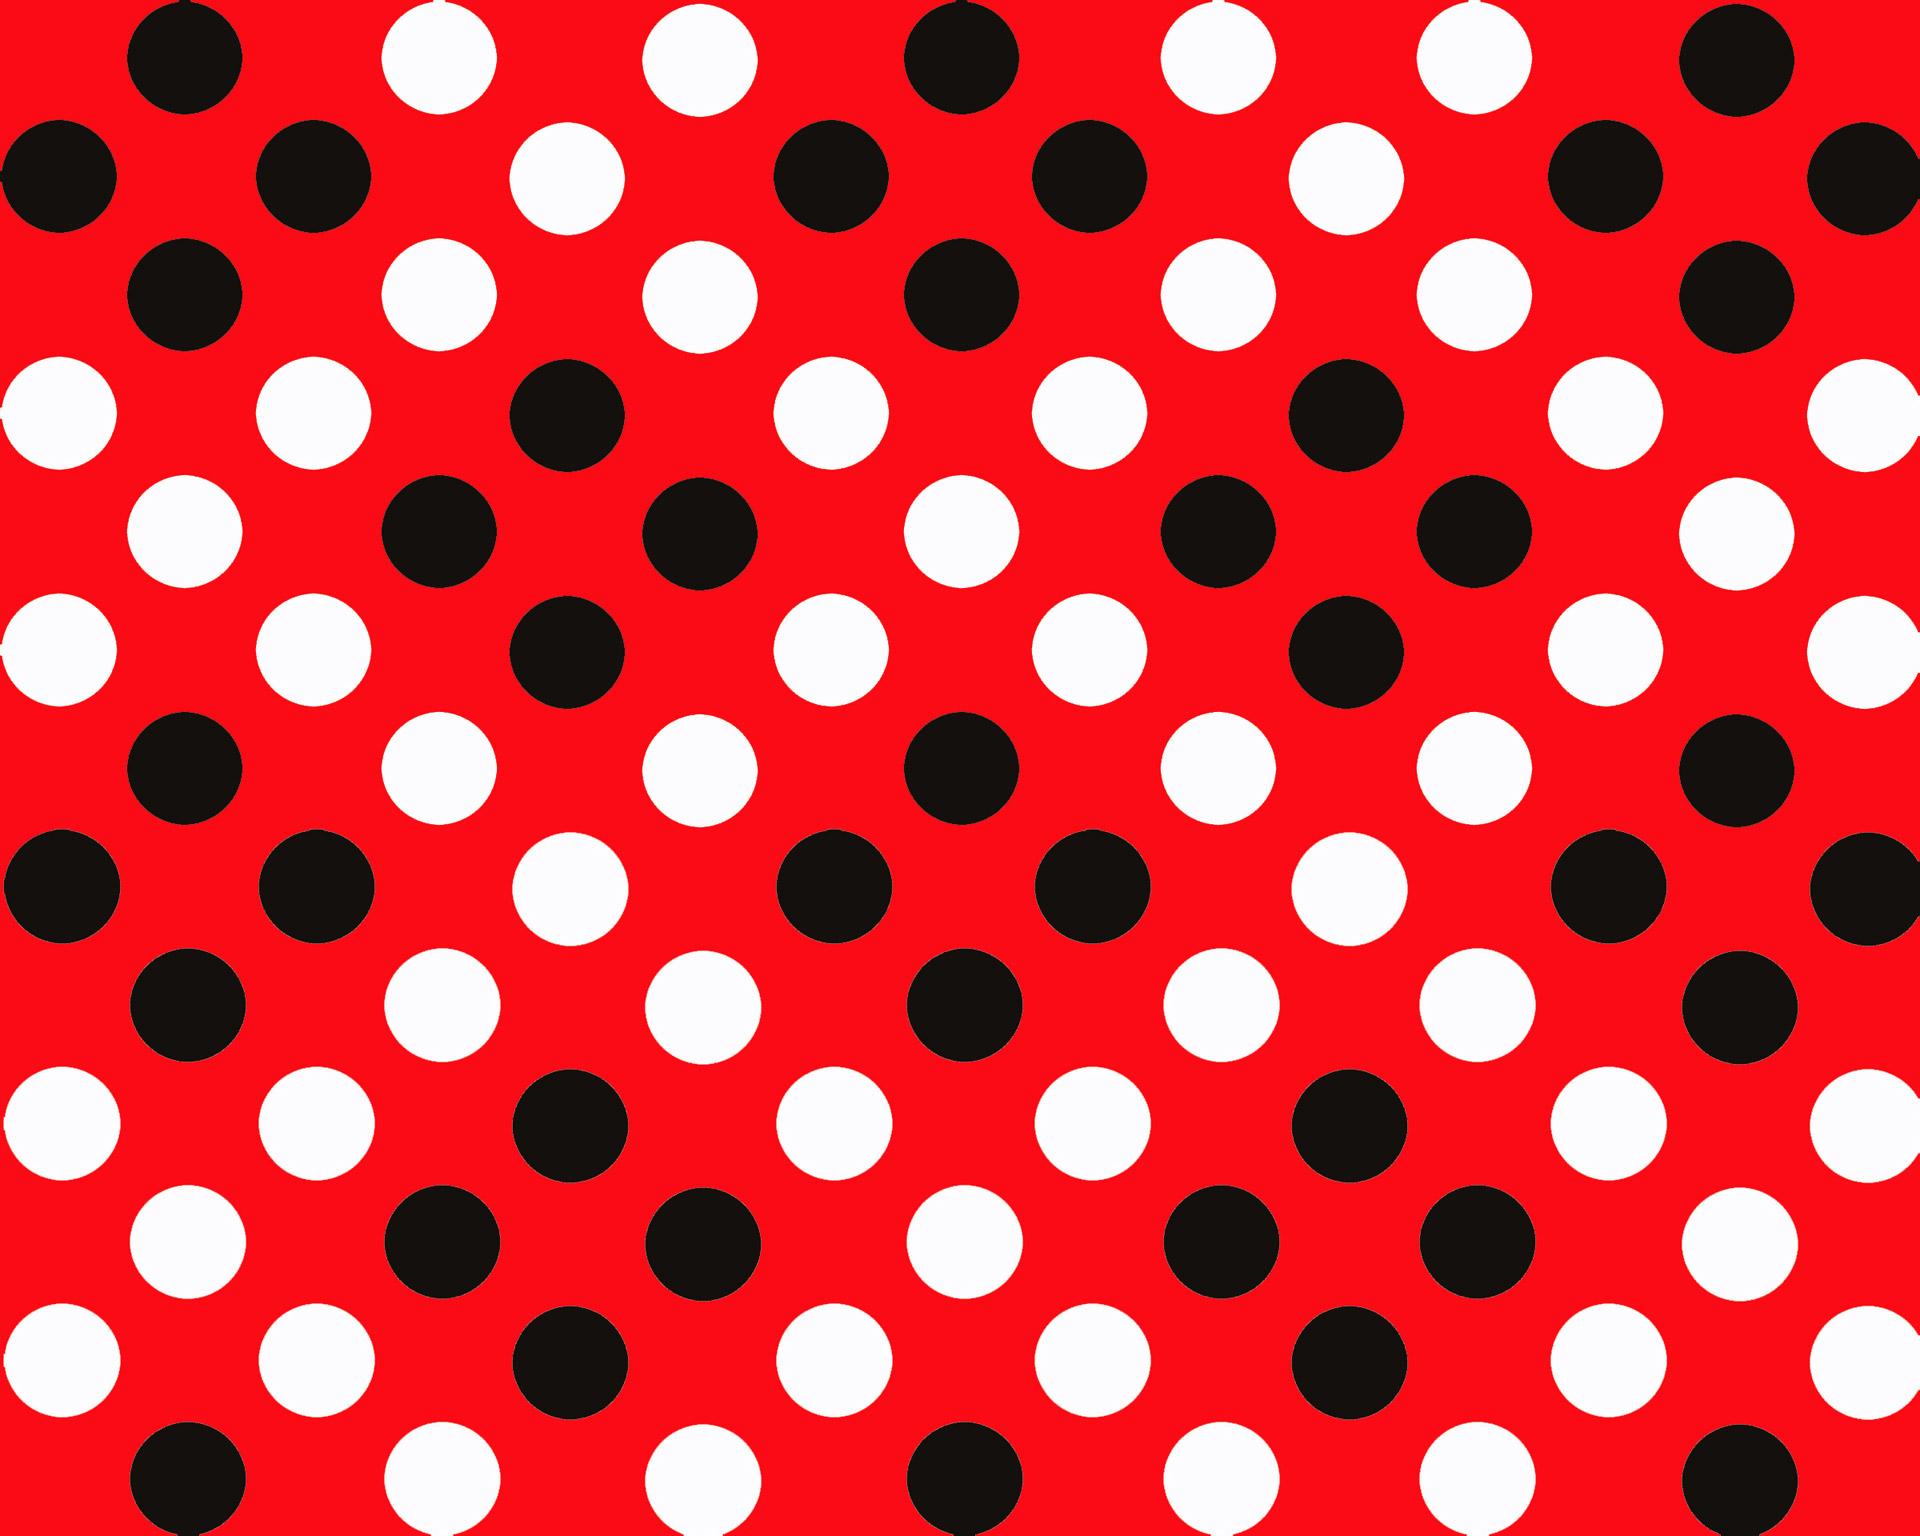 Black And White Polka Dot Wallpaper Wallpapers HD Fine 1920x1536